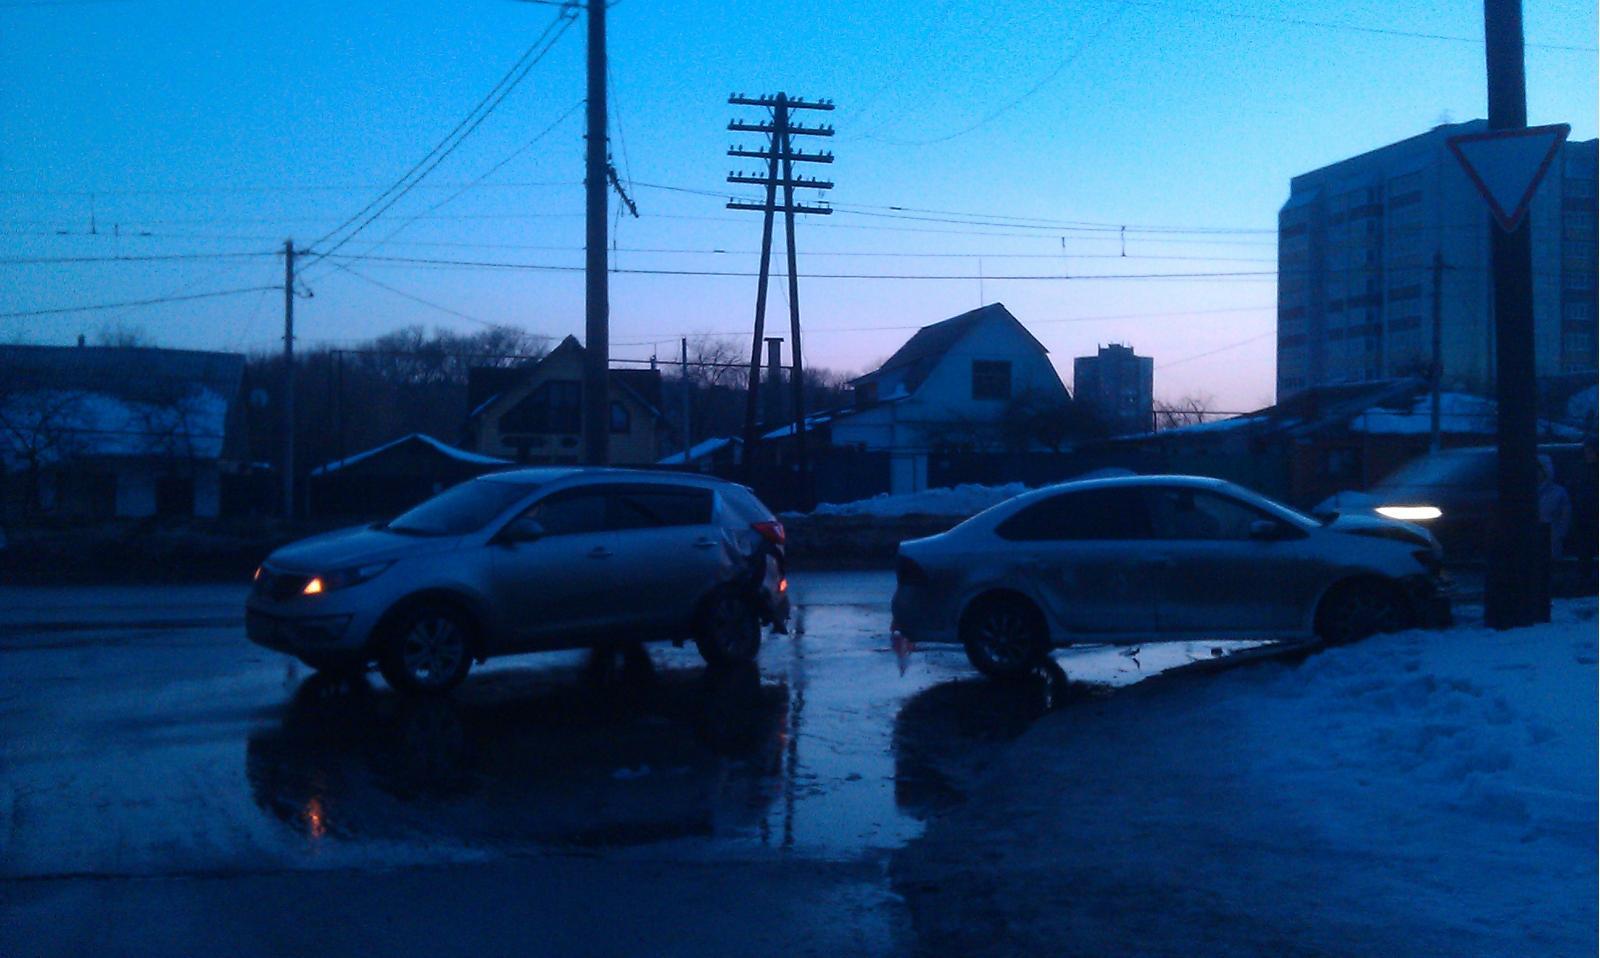 ВКурске шофёр «Mitsubishi» протаранил троллейбус: пострадали два человека